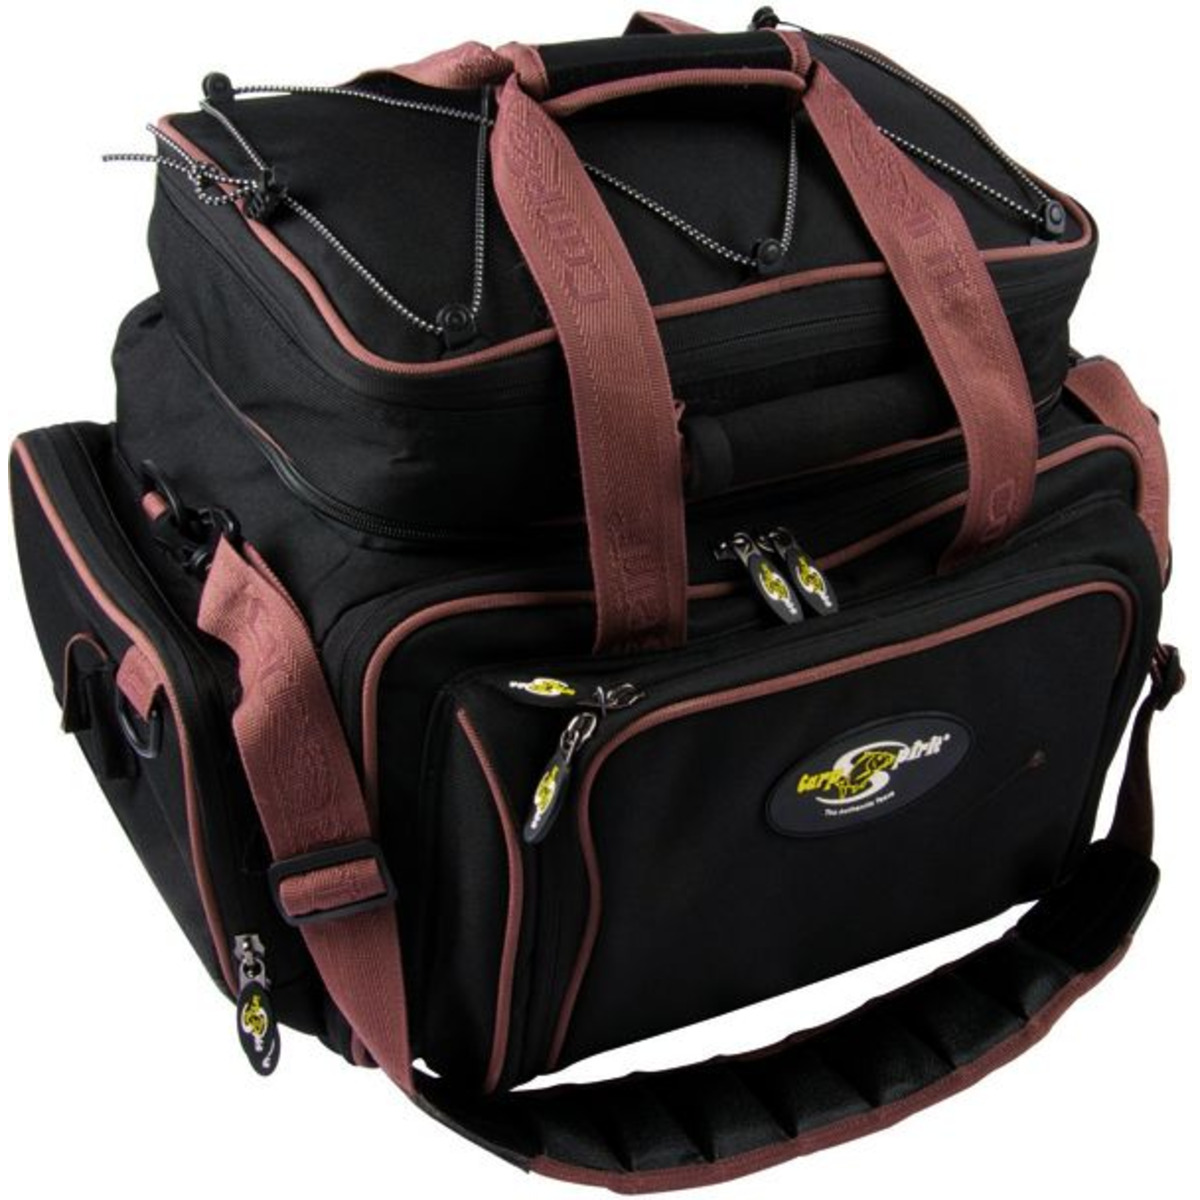 Carp Spirit Bags and Large Boxes - 3.0 kg - 50x34x35 cm